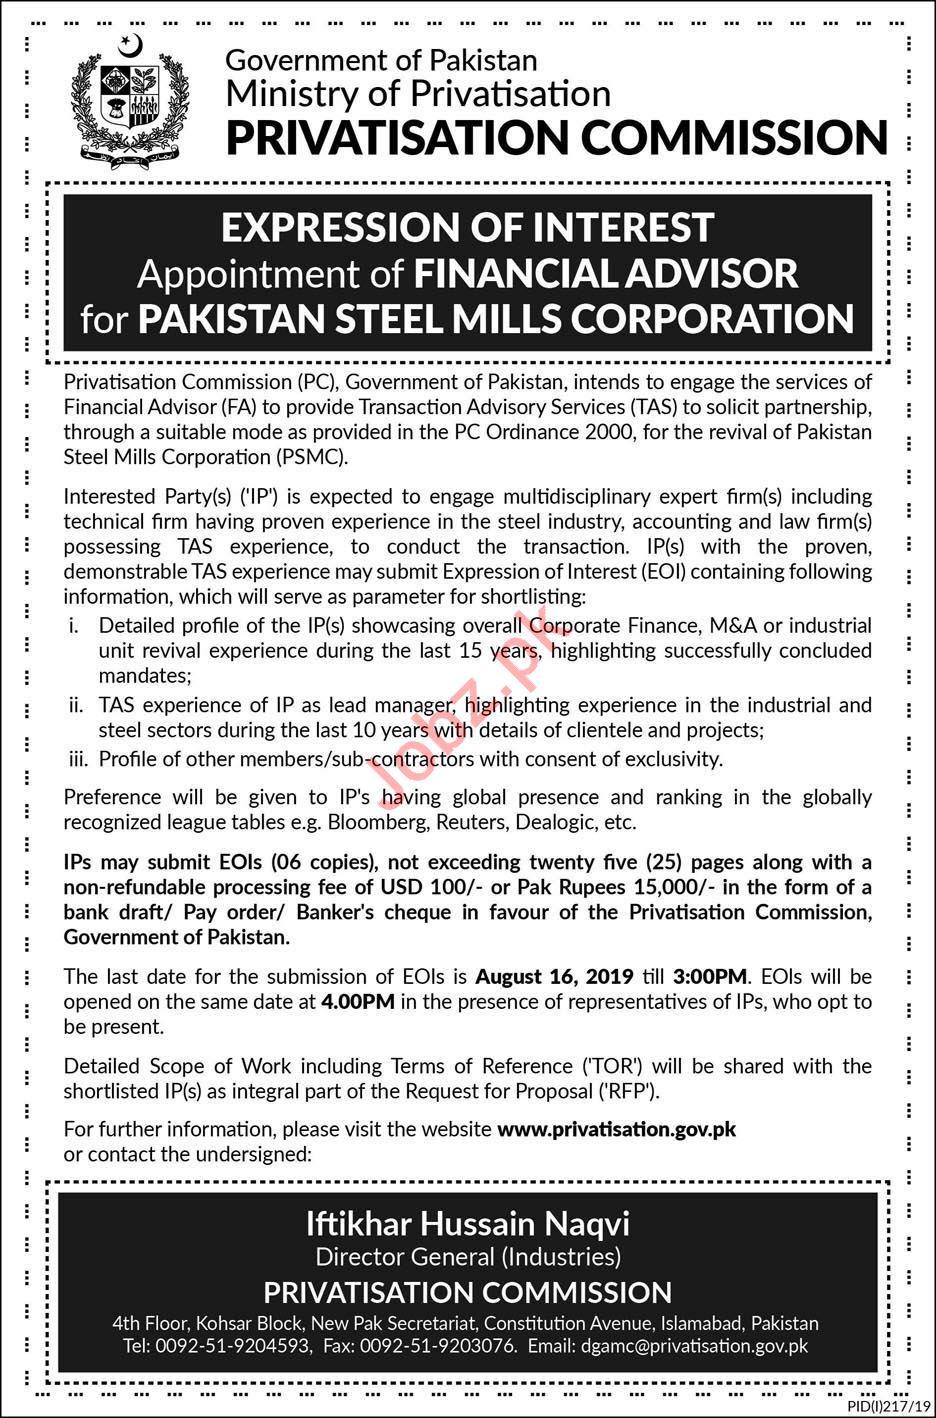 Privatisation Commission Job 2019 For Financial Advisor